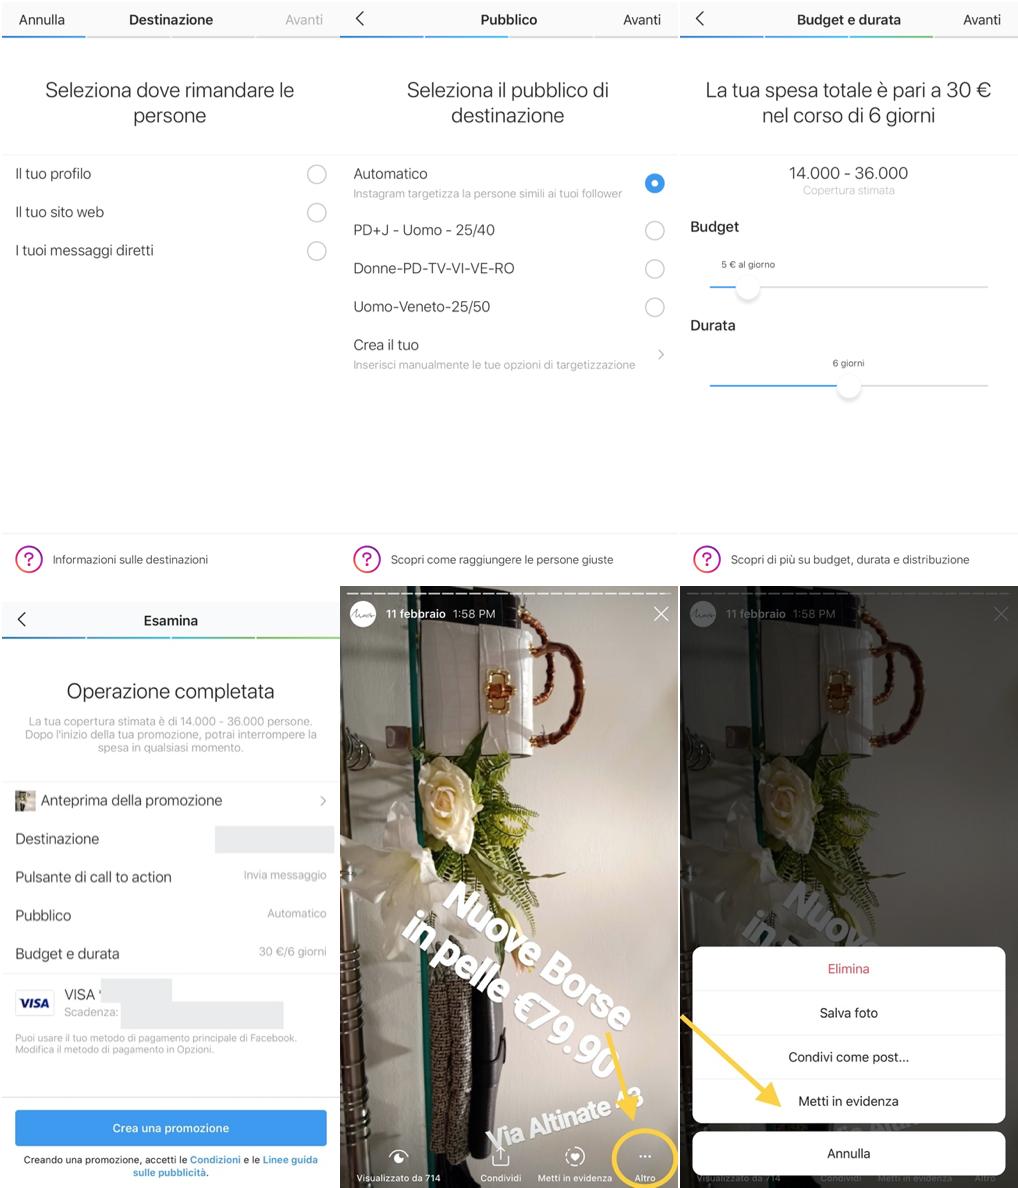 Pubblicità Instagram Stories tramite l'app